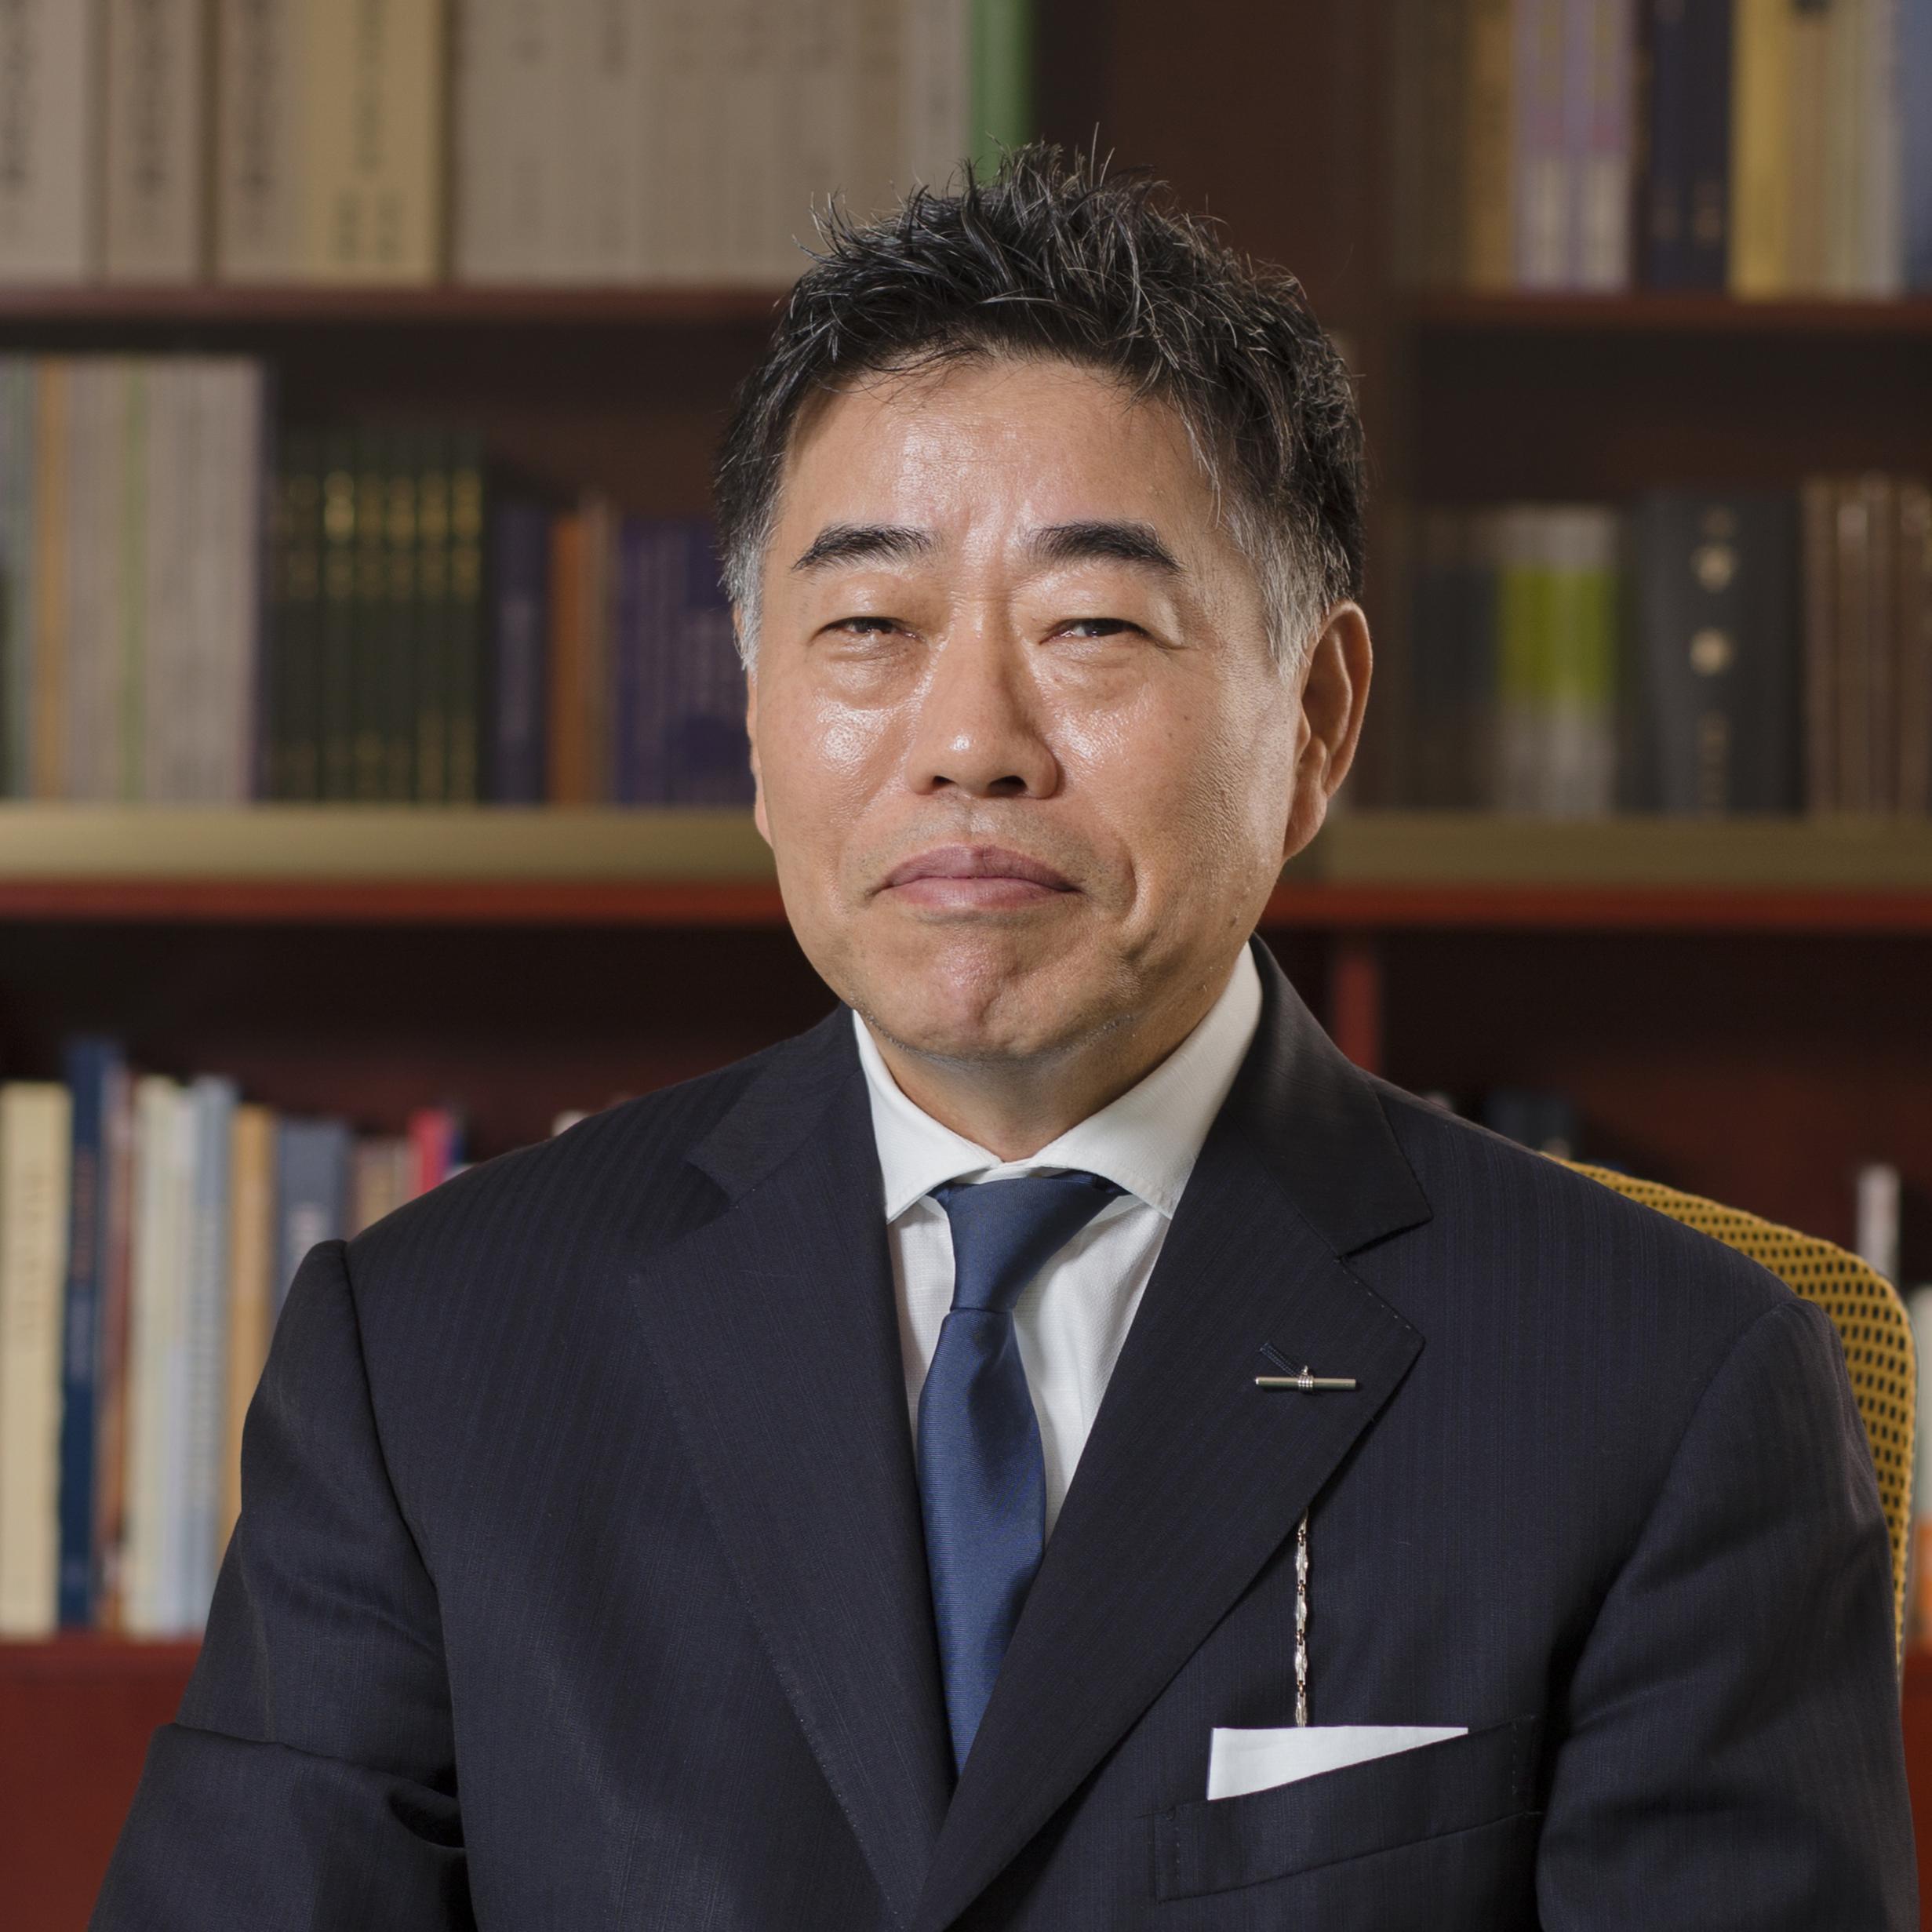 Keiichiro Tsuchiya, President, Meiji University